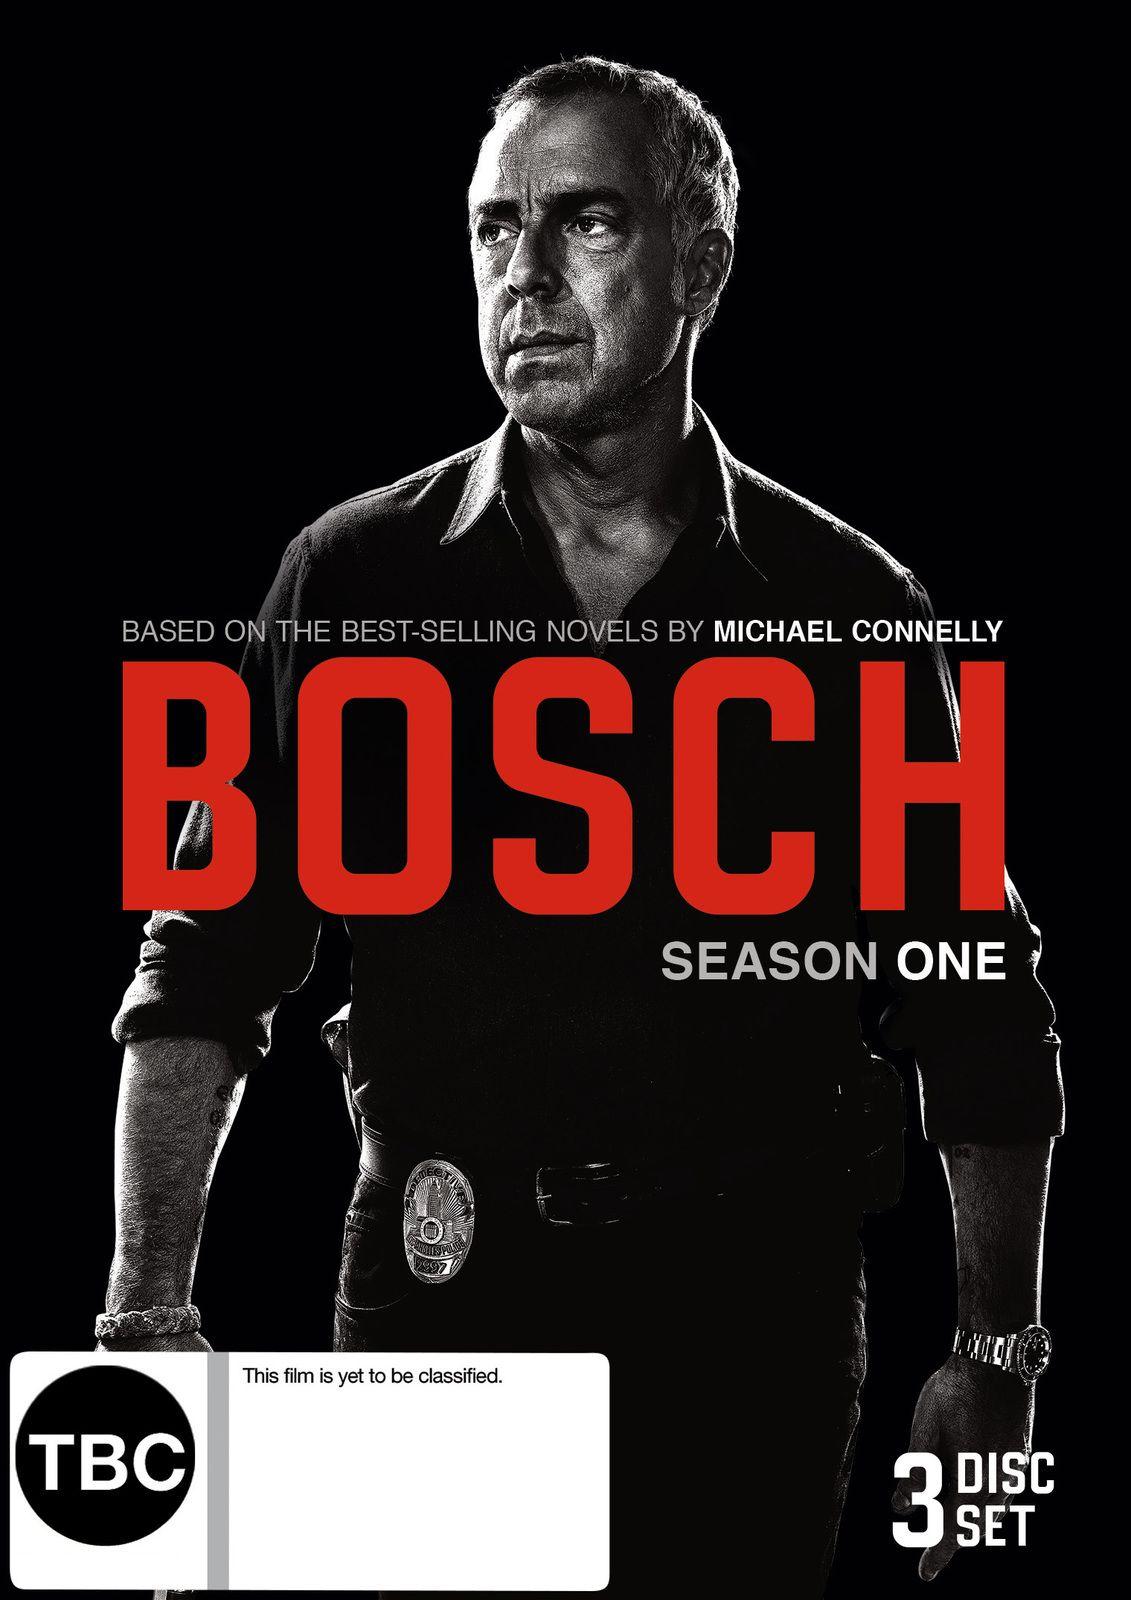 Bosch season 1 dvd bosch michael connelly bosch